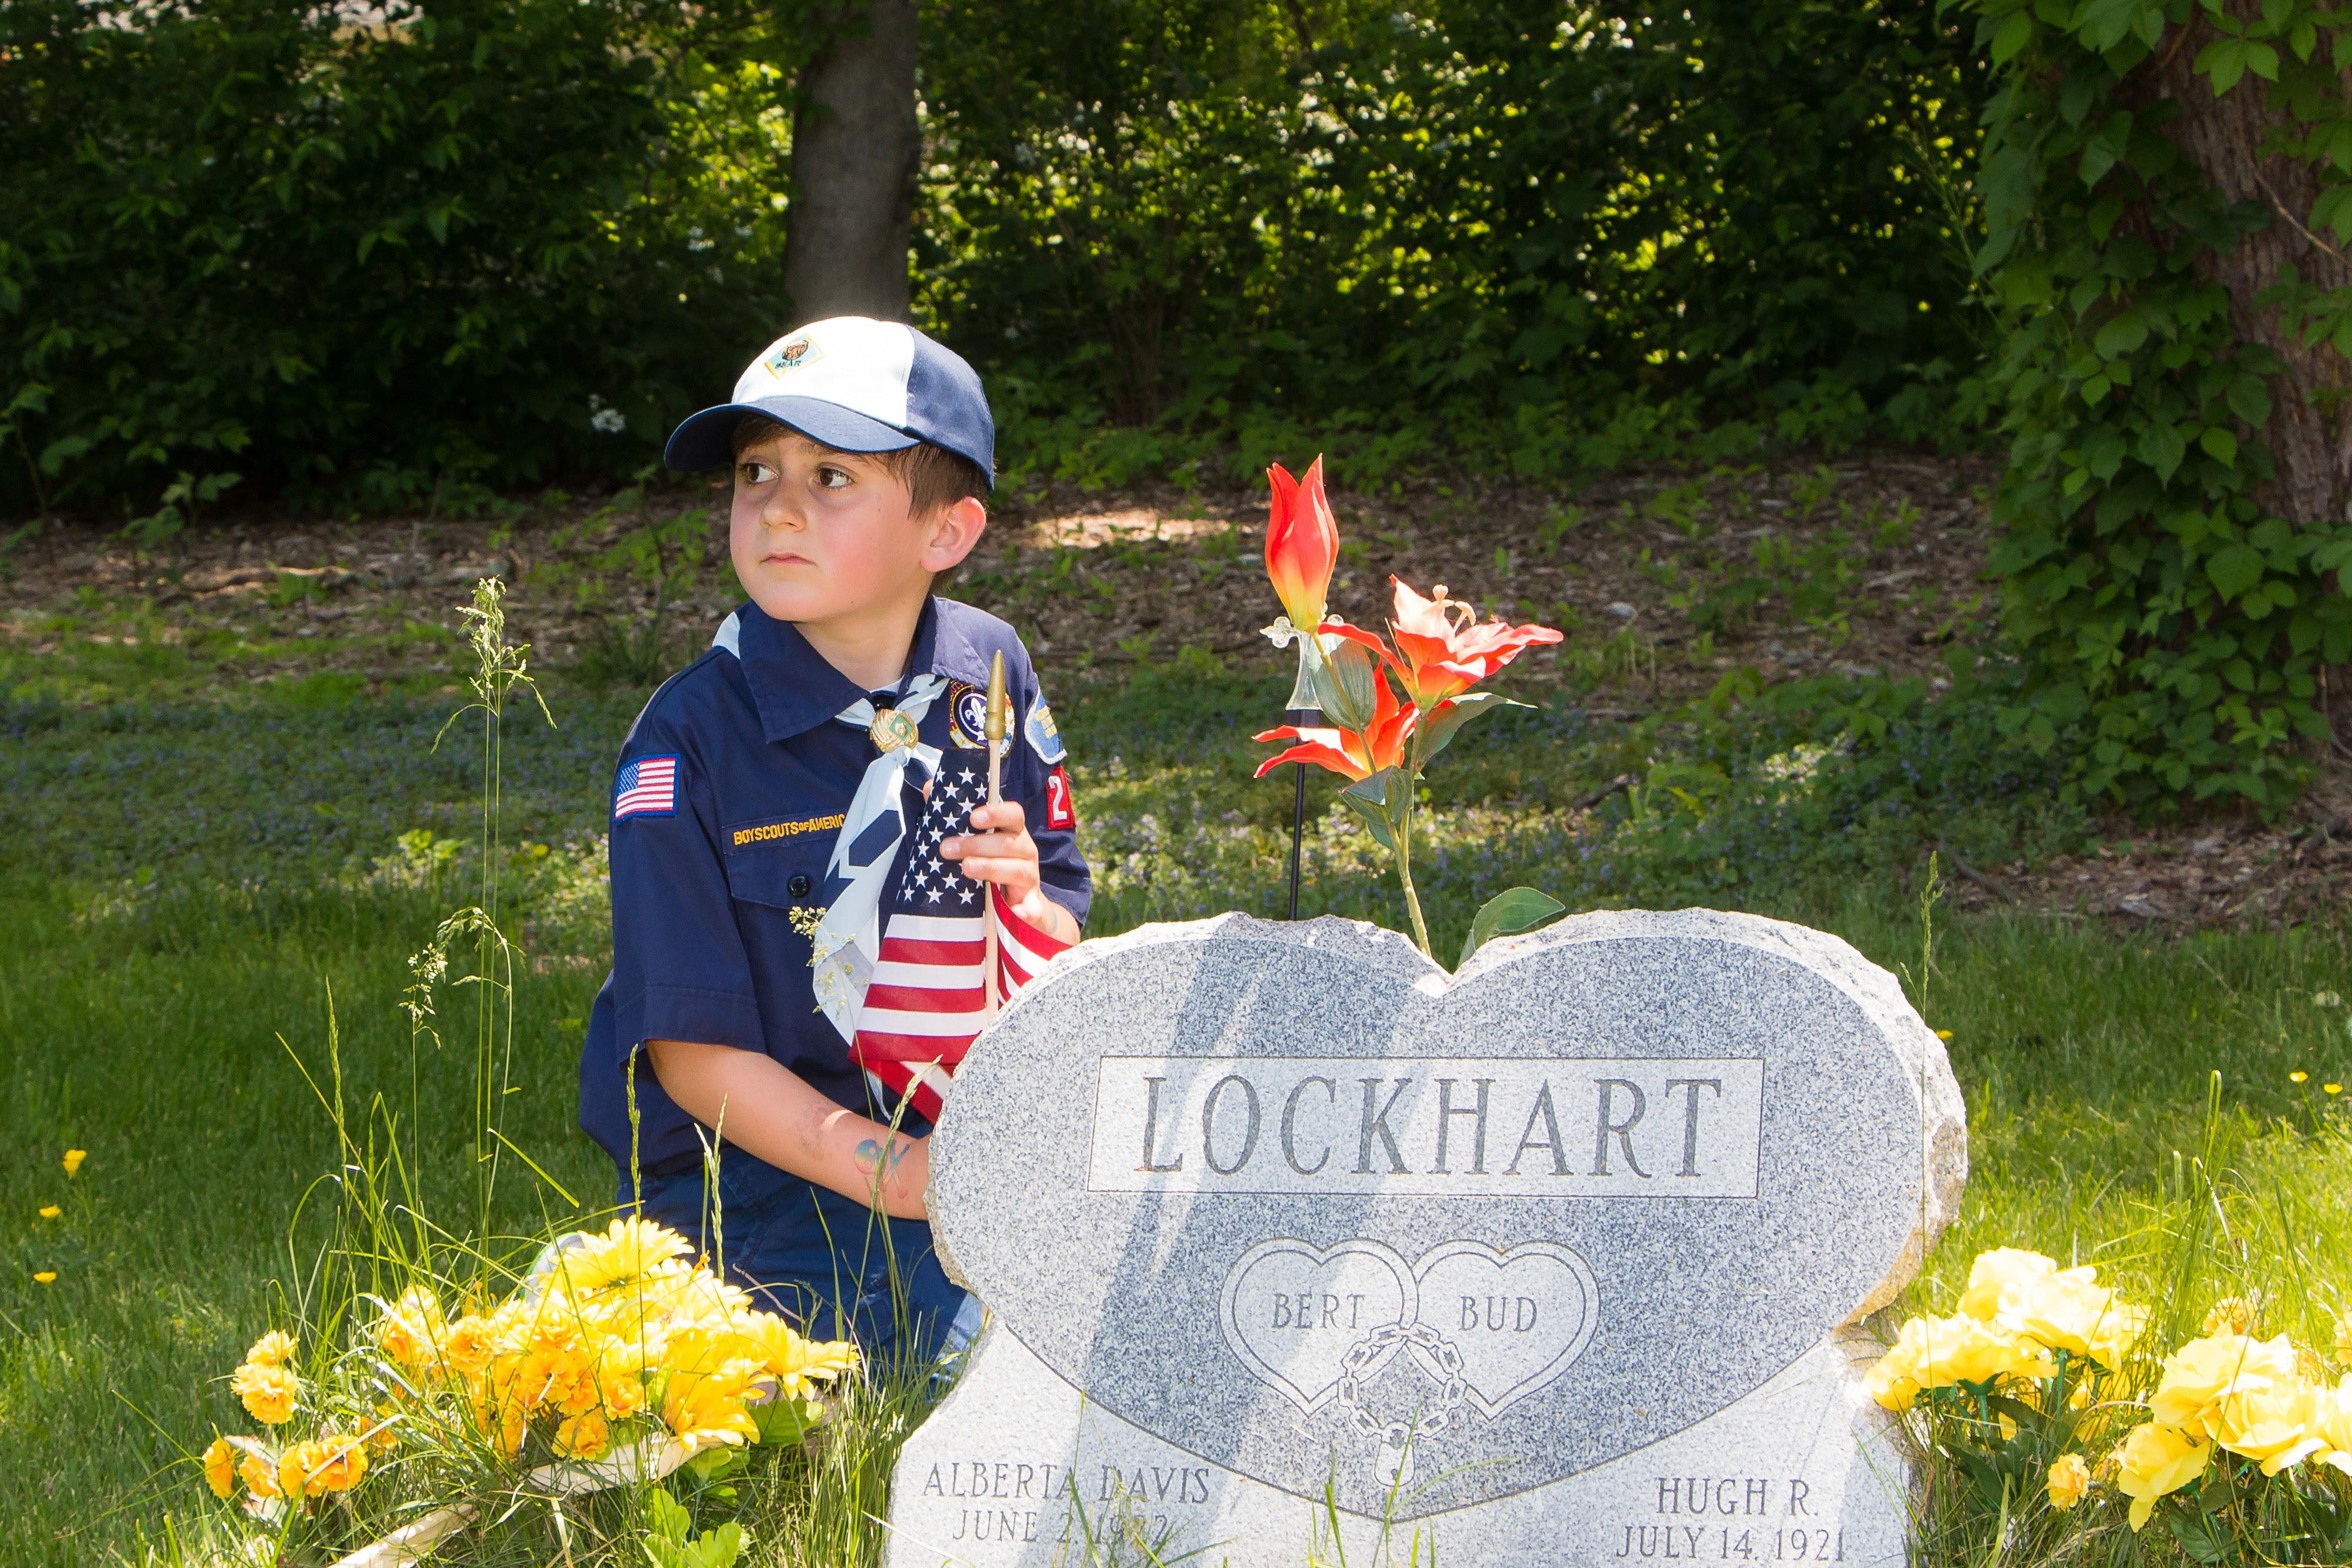 131fe303a4dd792c1c2e_20160528_Boy_Scouts_Memorial_Day_Flag_Settng_099.jpg